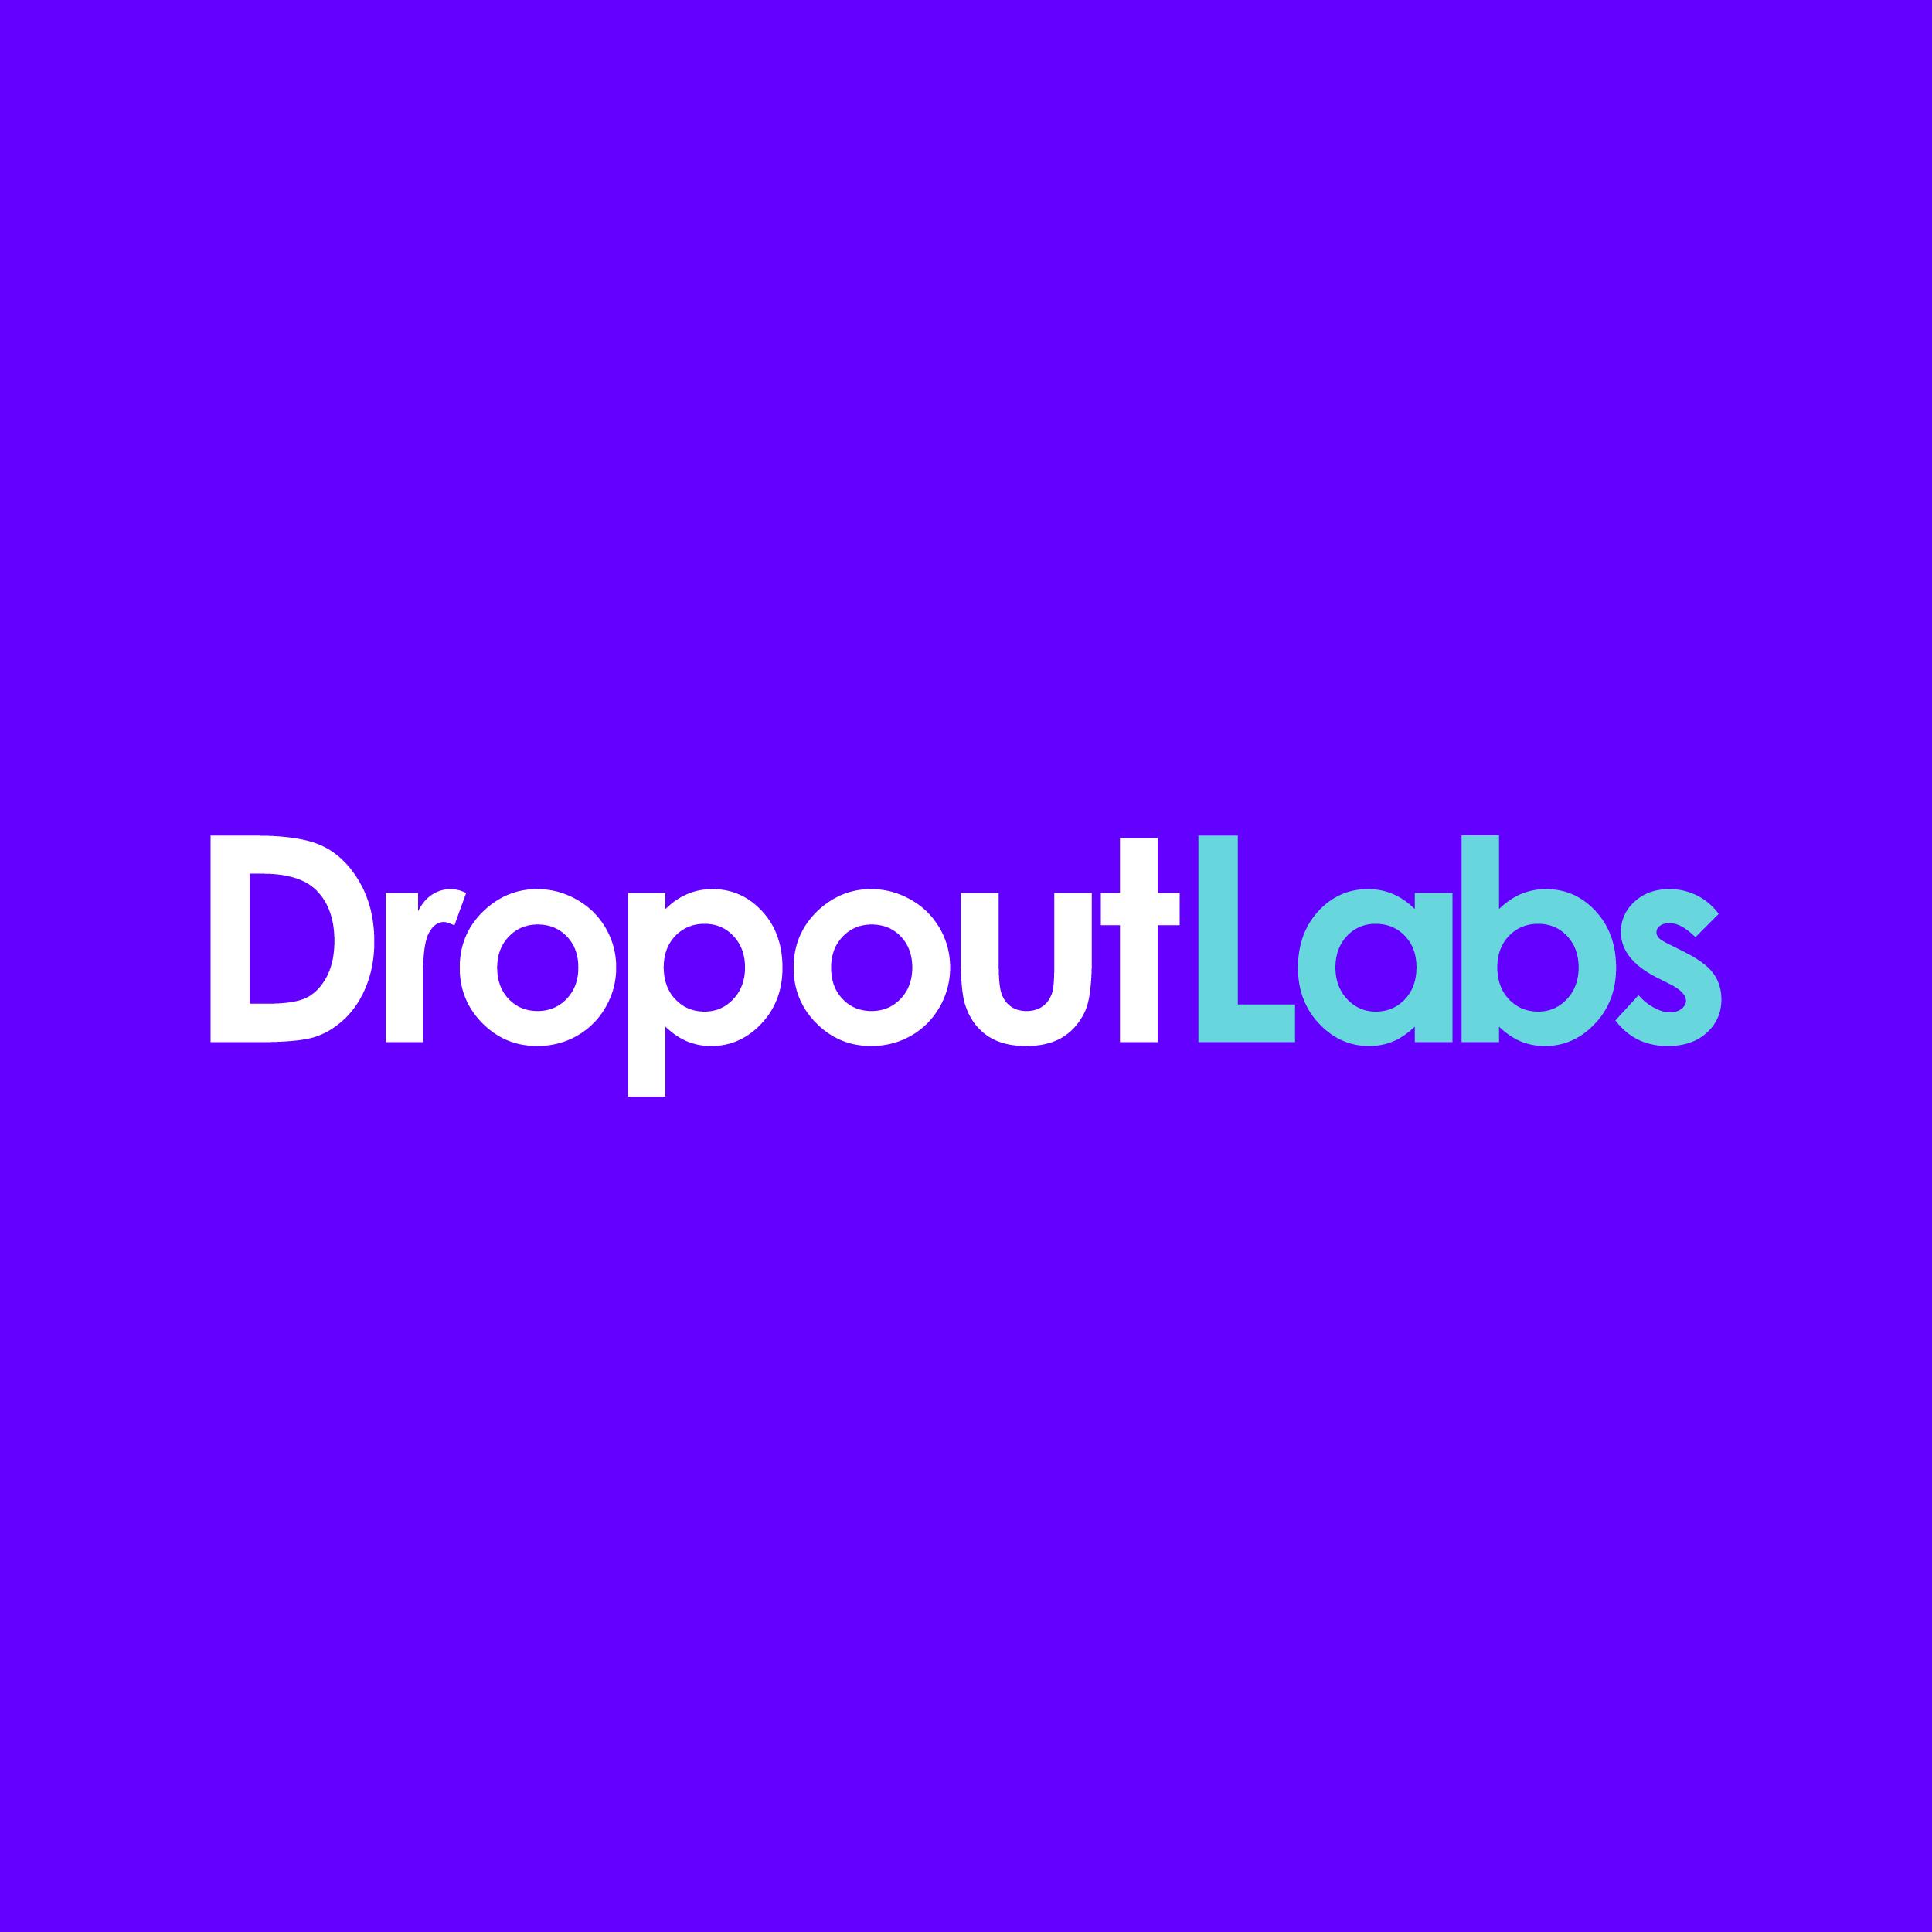 dropout-labs-logo-2500.png